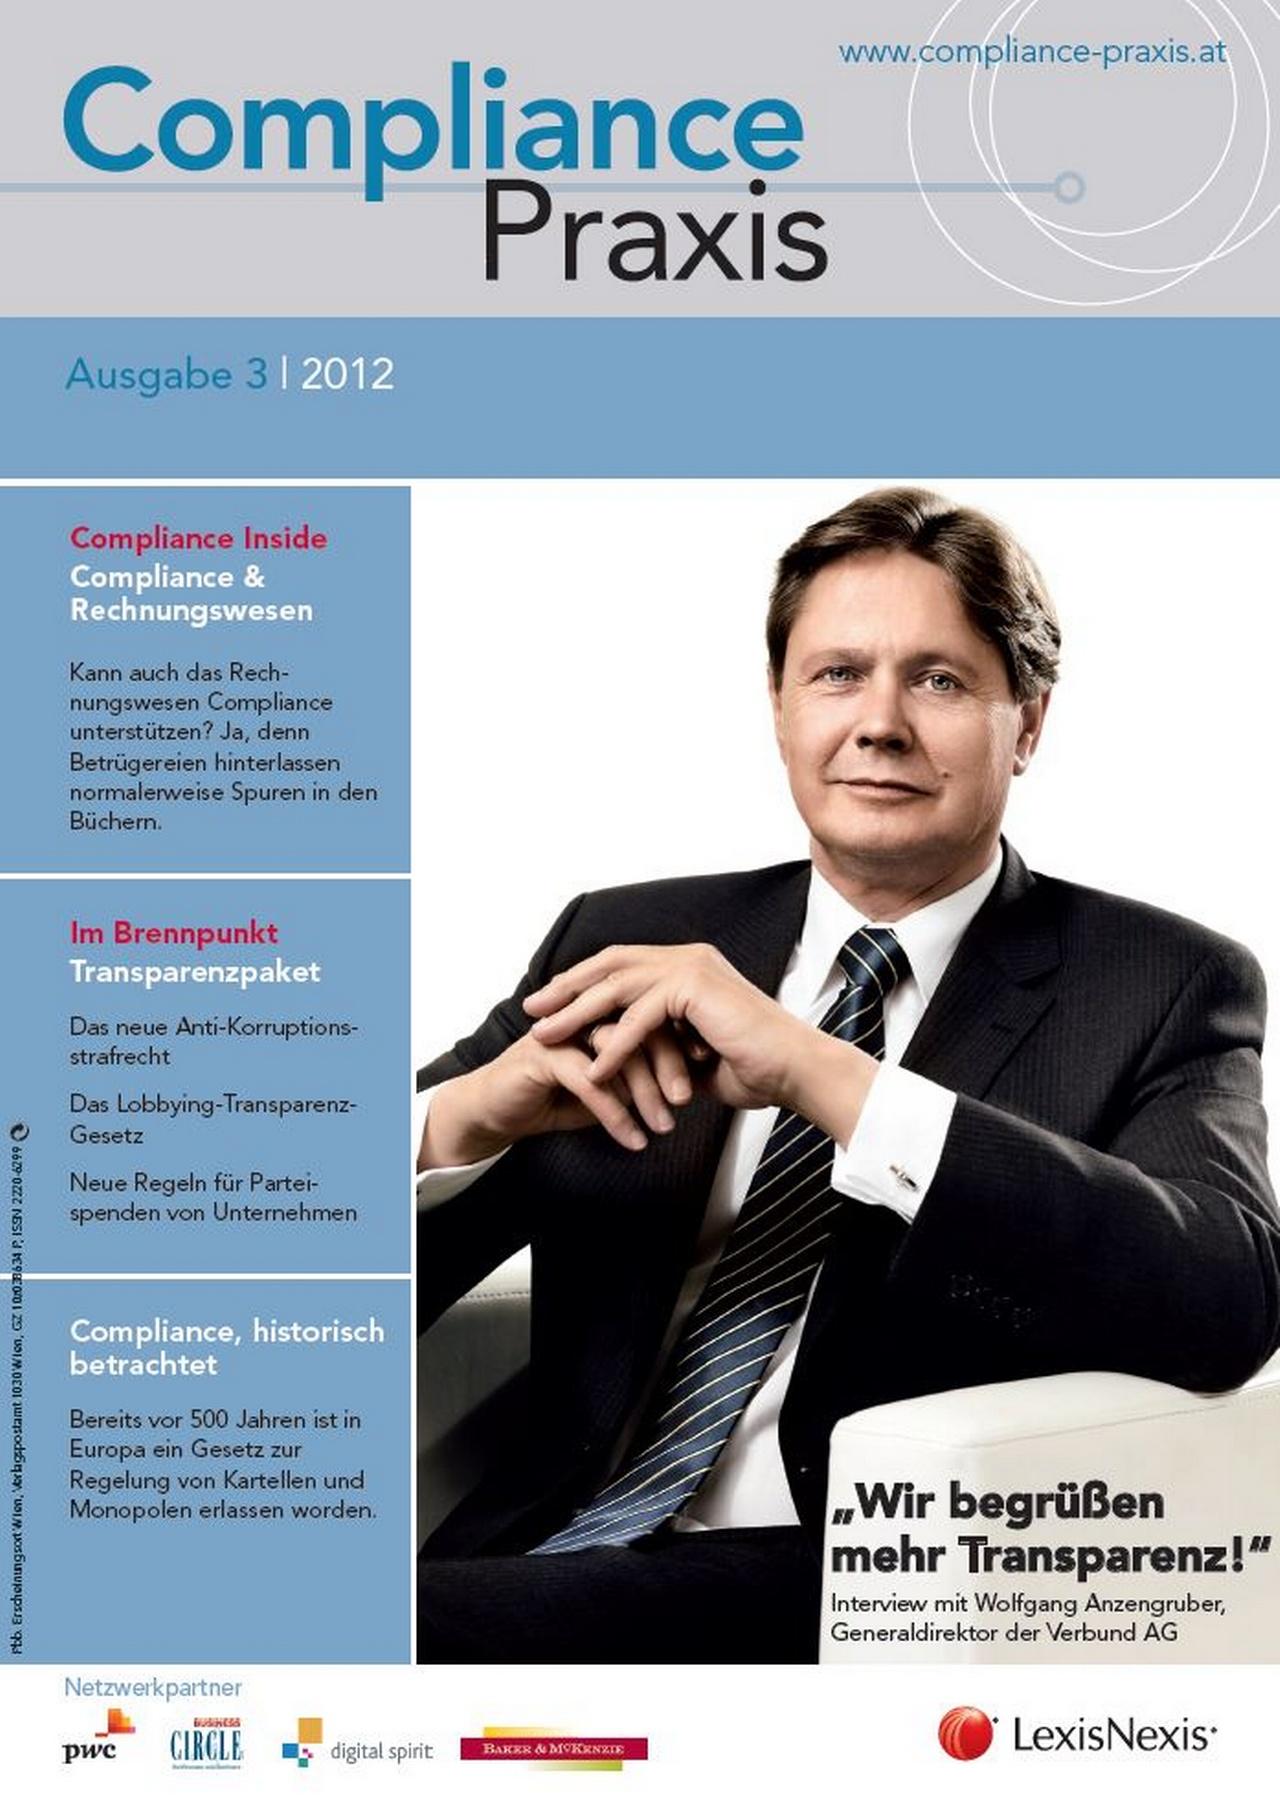 Cover von Compliance Praxis Ausgabe 3/2012, © LexisNexis